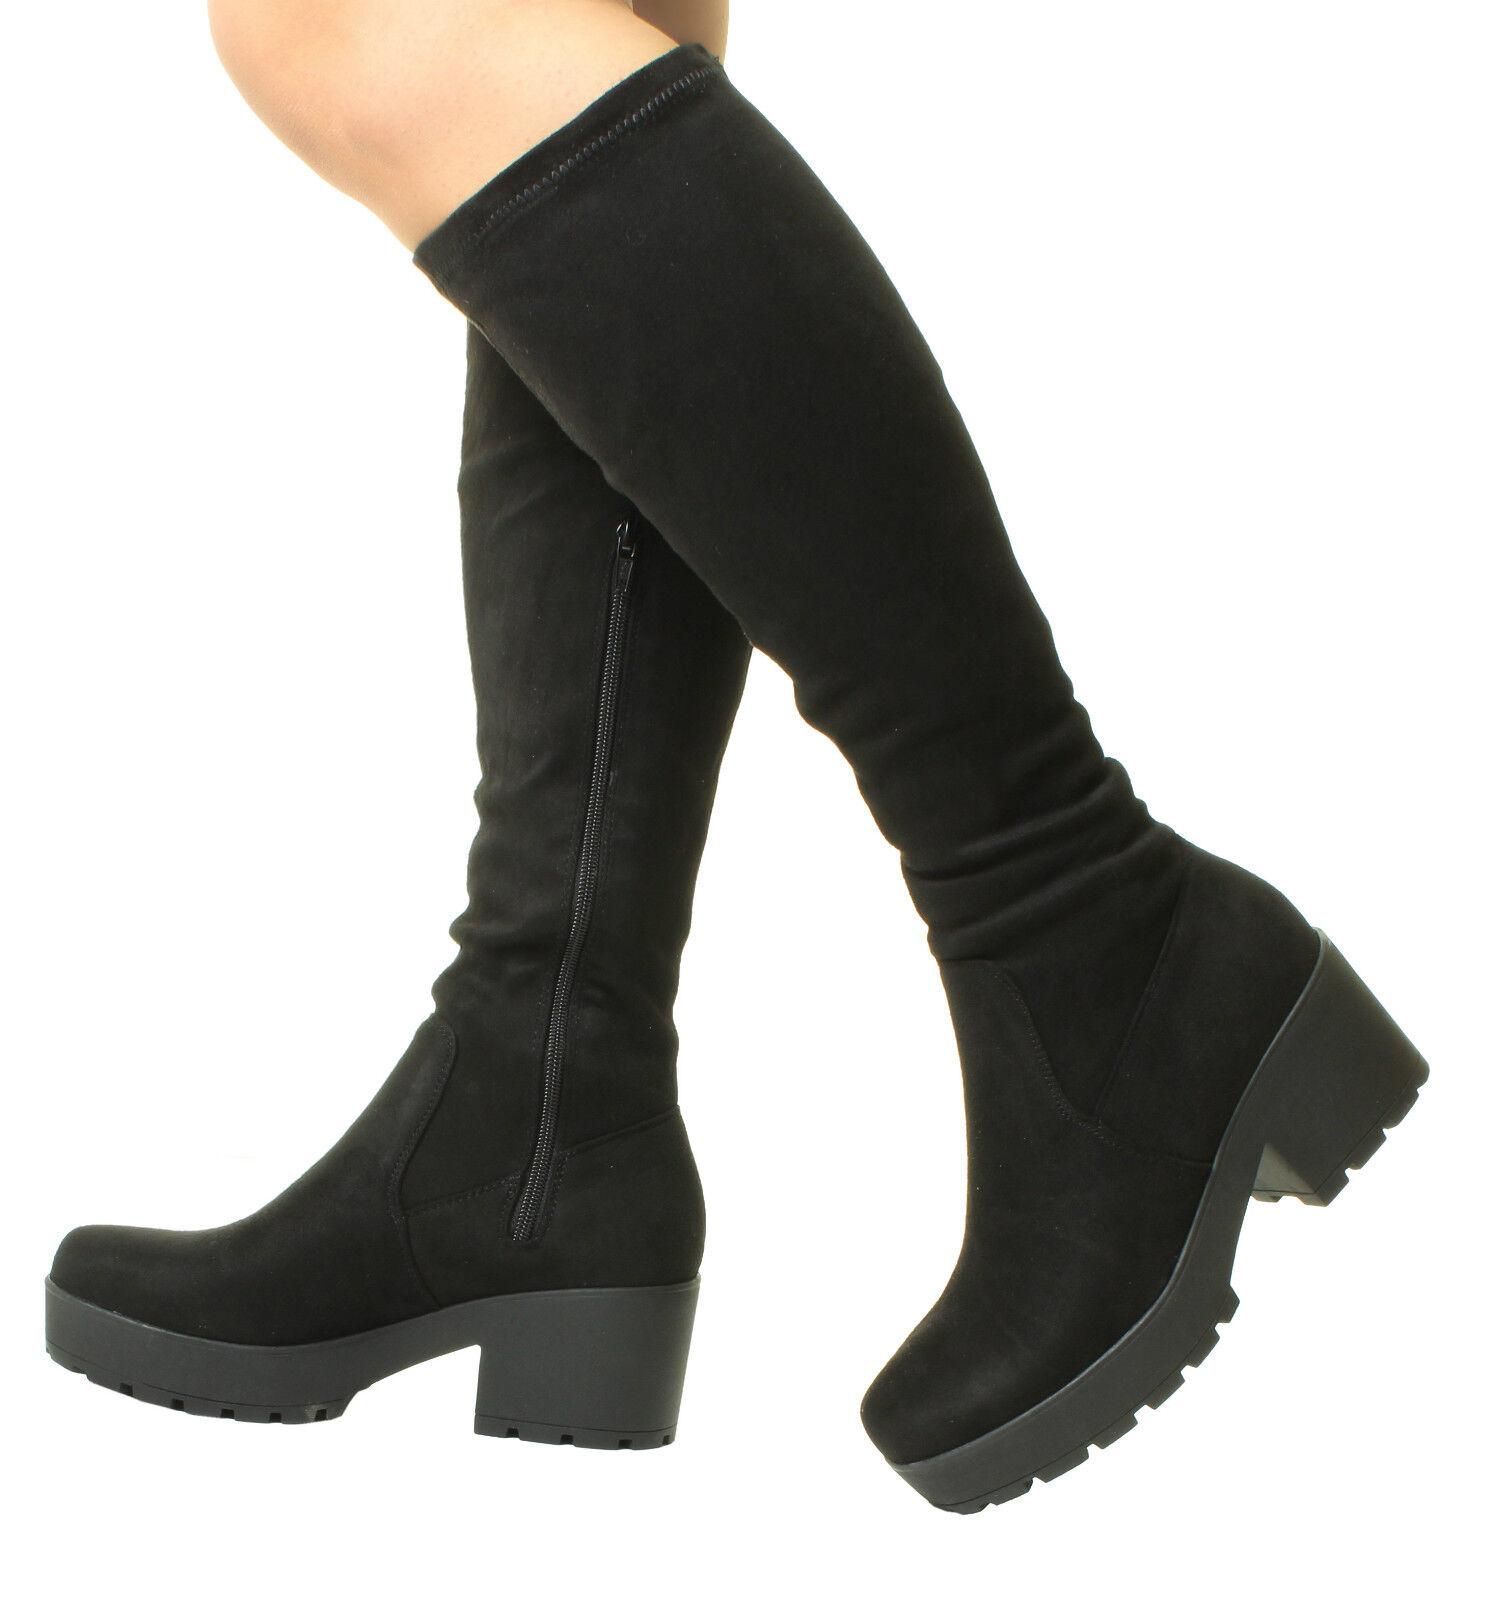 Ladies Mujer Negro Chunky Heel Suede Calf Stretch Wide Calf Fit Calf Suede Knee High botas fe42f7